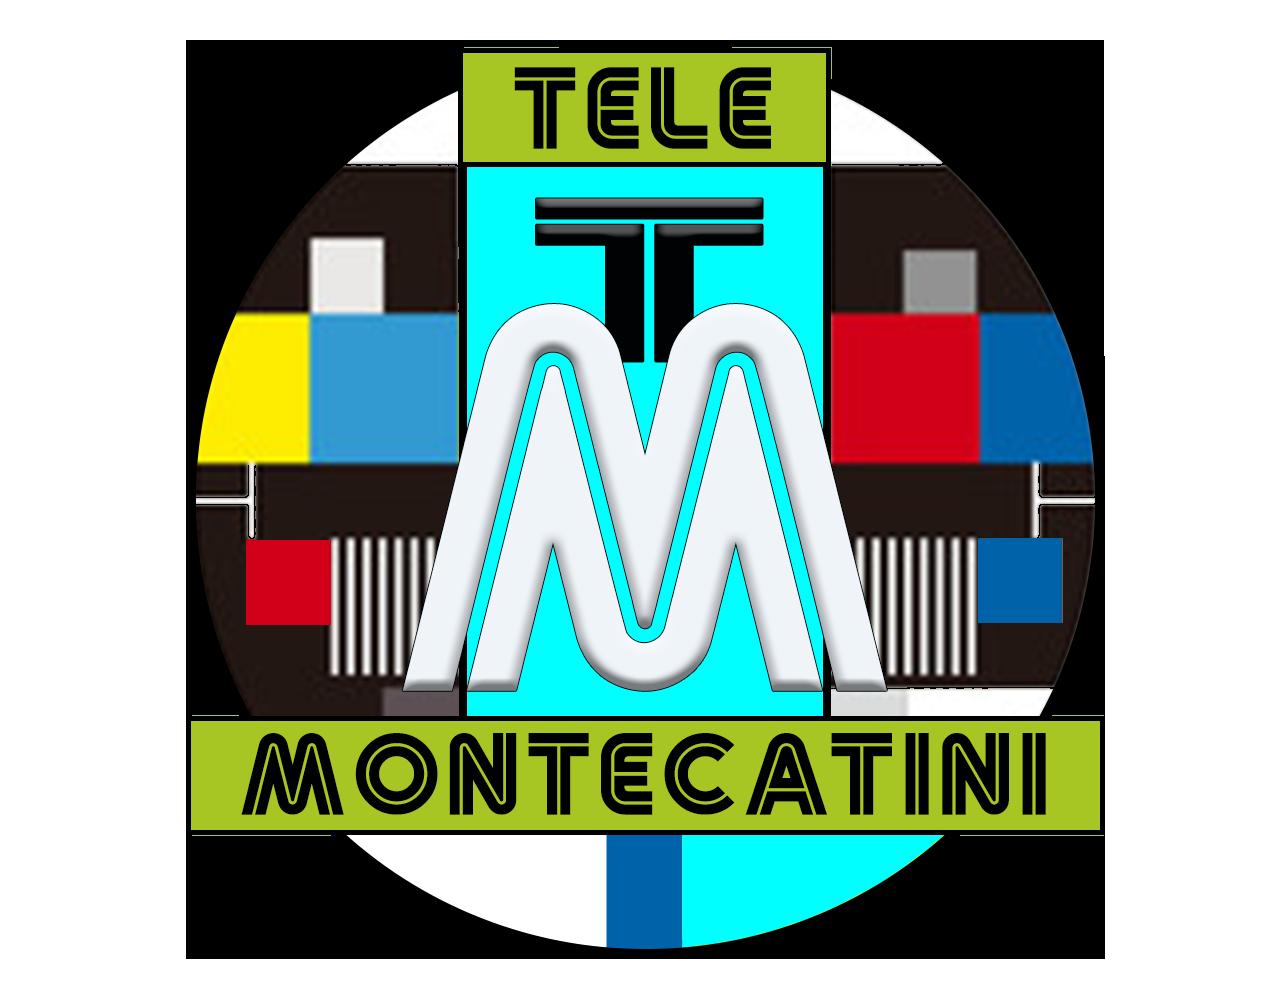 TeleMontecatini